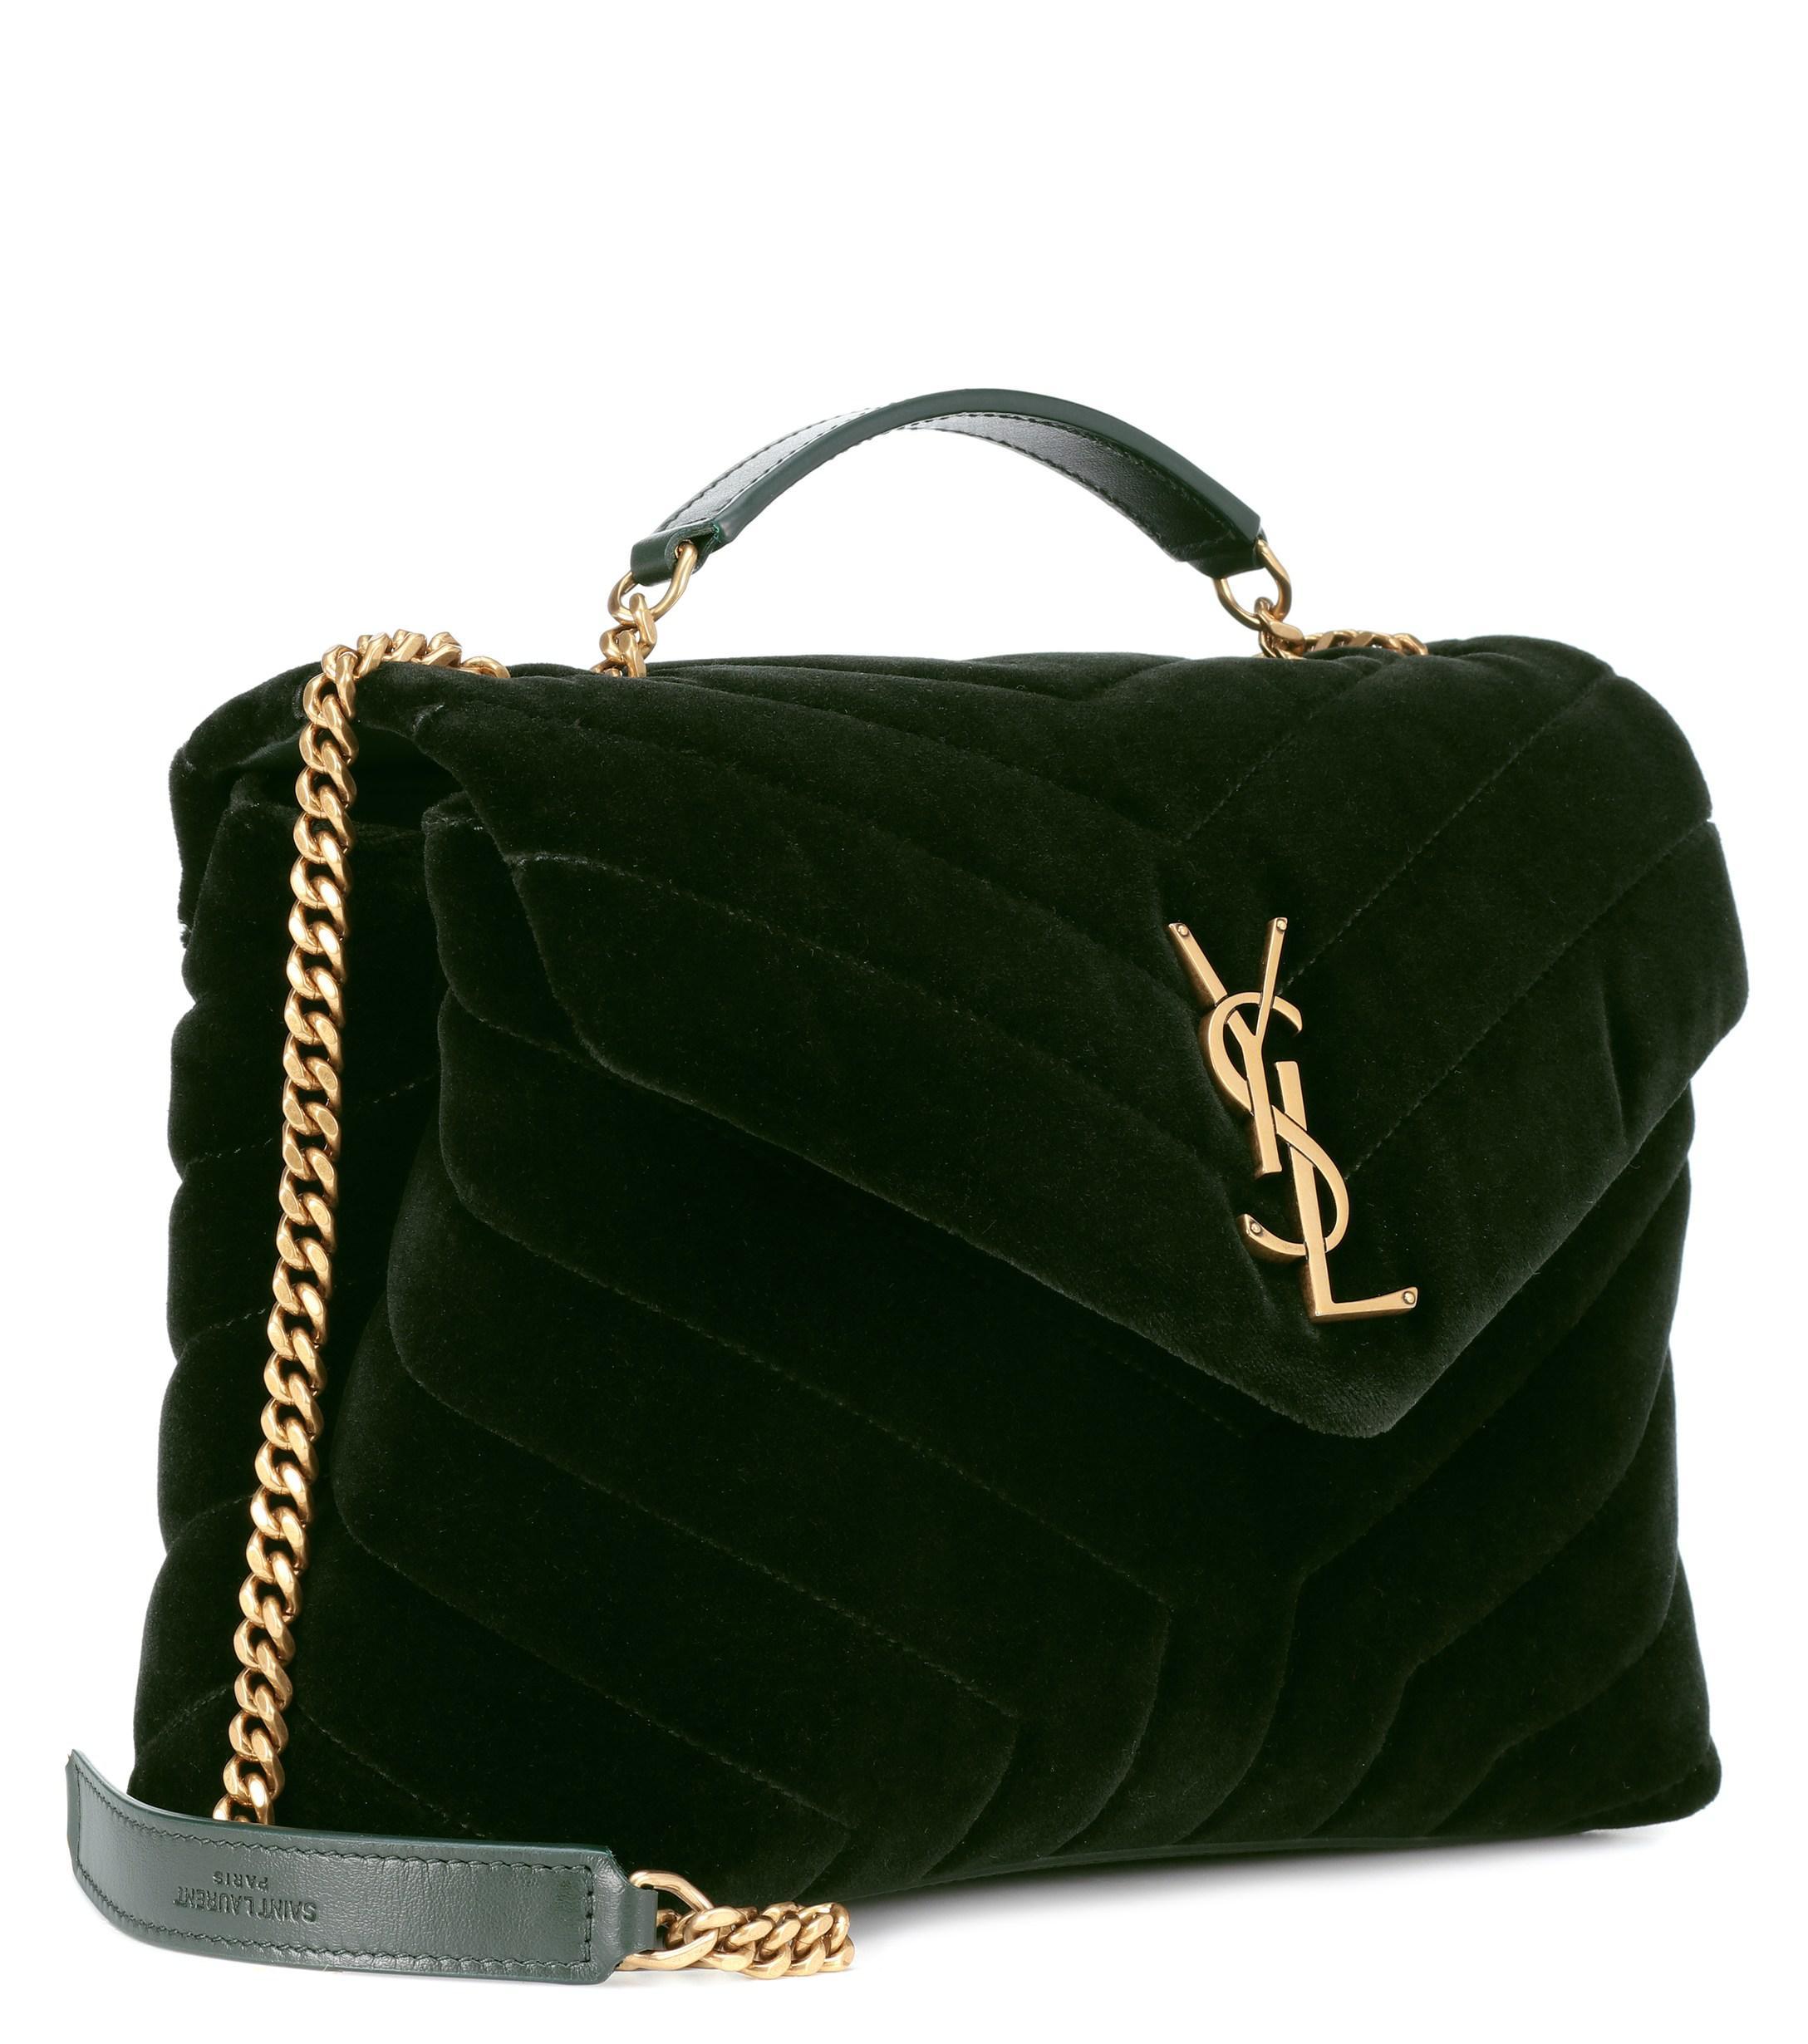 038a76ee0ab Saint Laurent Small Loulou Monogram Velvet Shoulder Bag in Green - Lyst